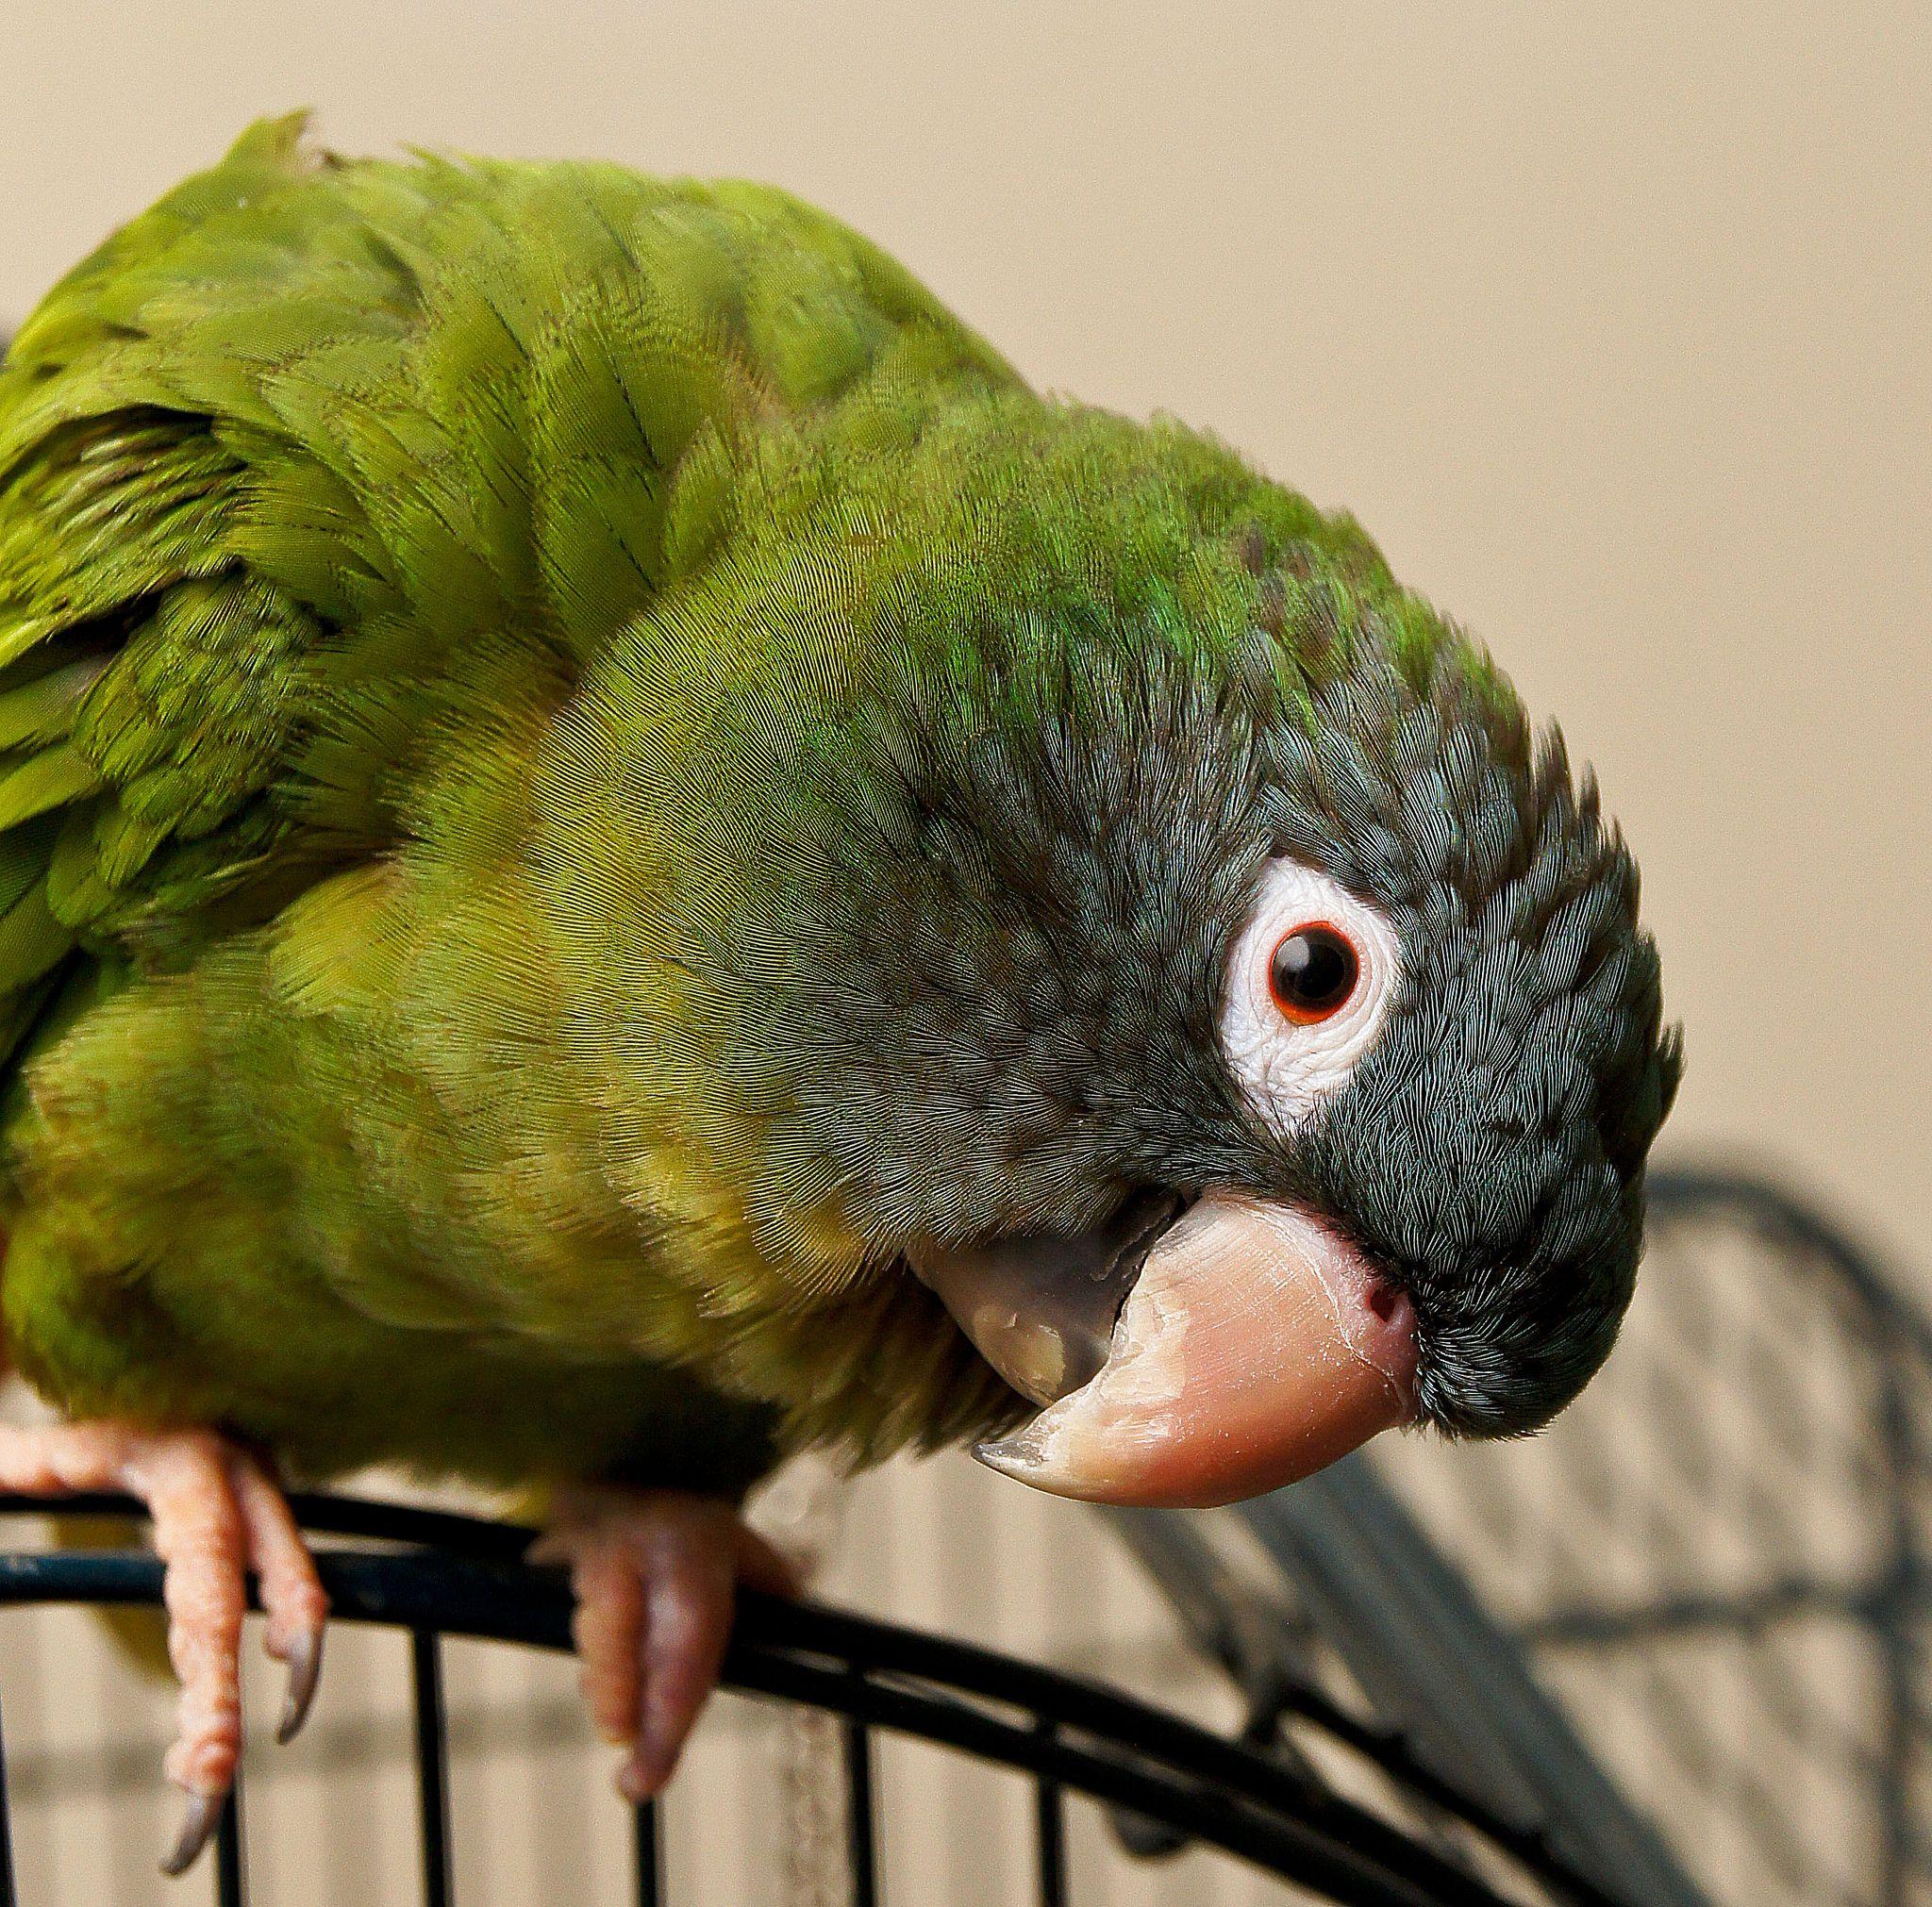 most colorful parrot species